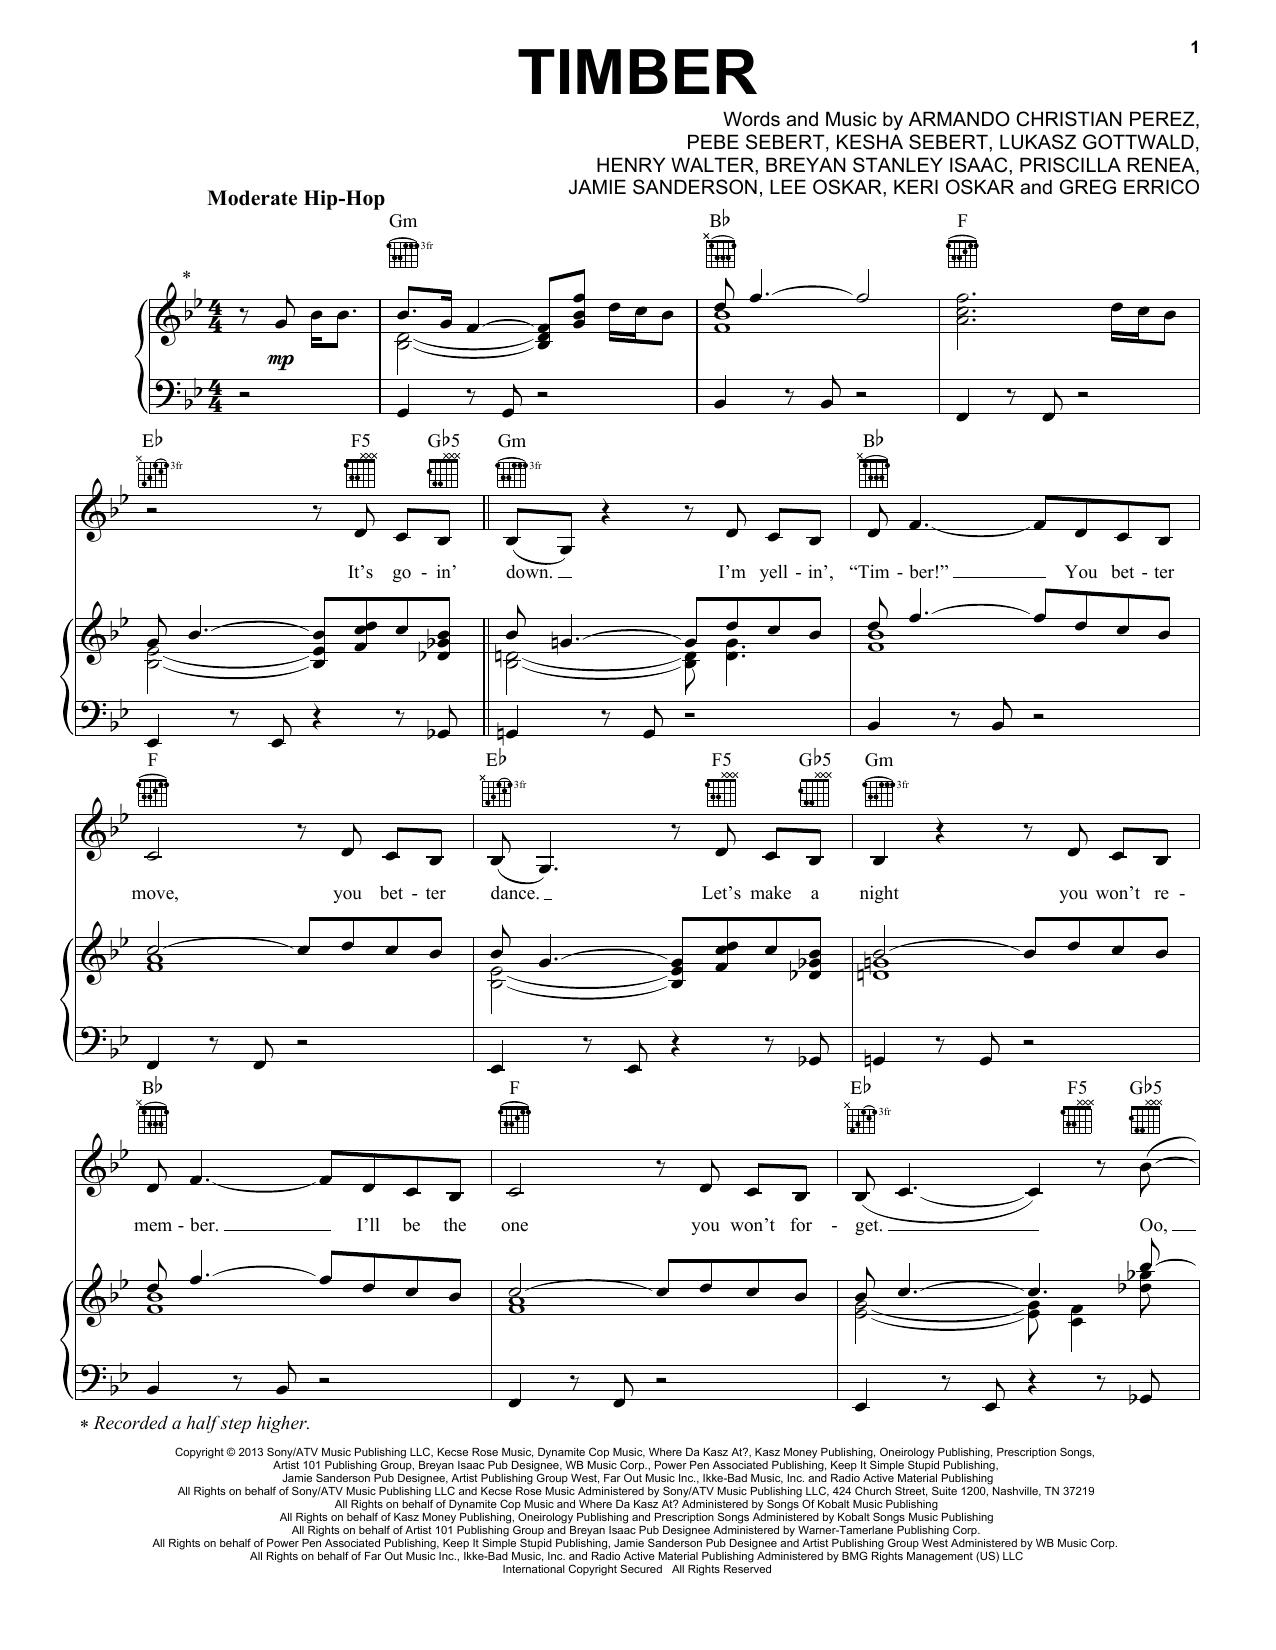 Pitbull Featuring Ke$ha Timber sheet music notes and chords. Download Printable PDF.